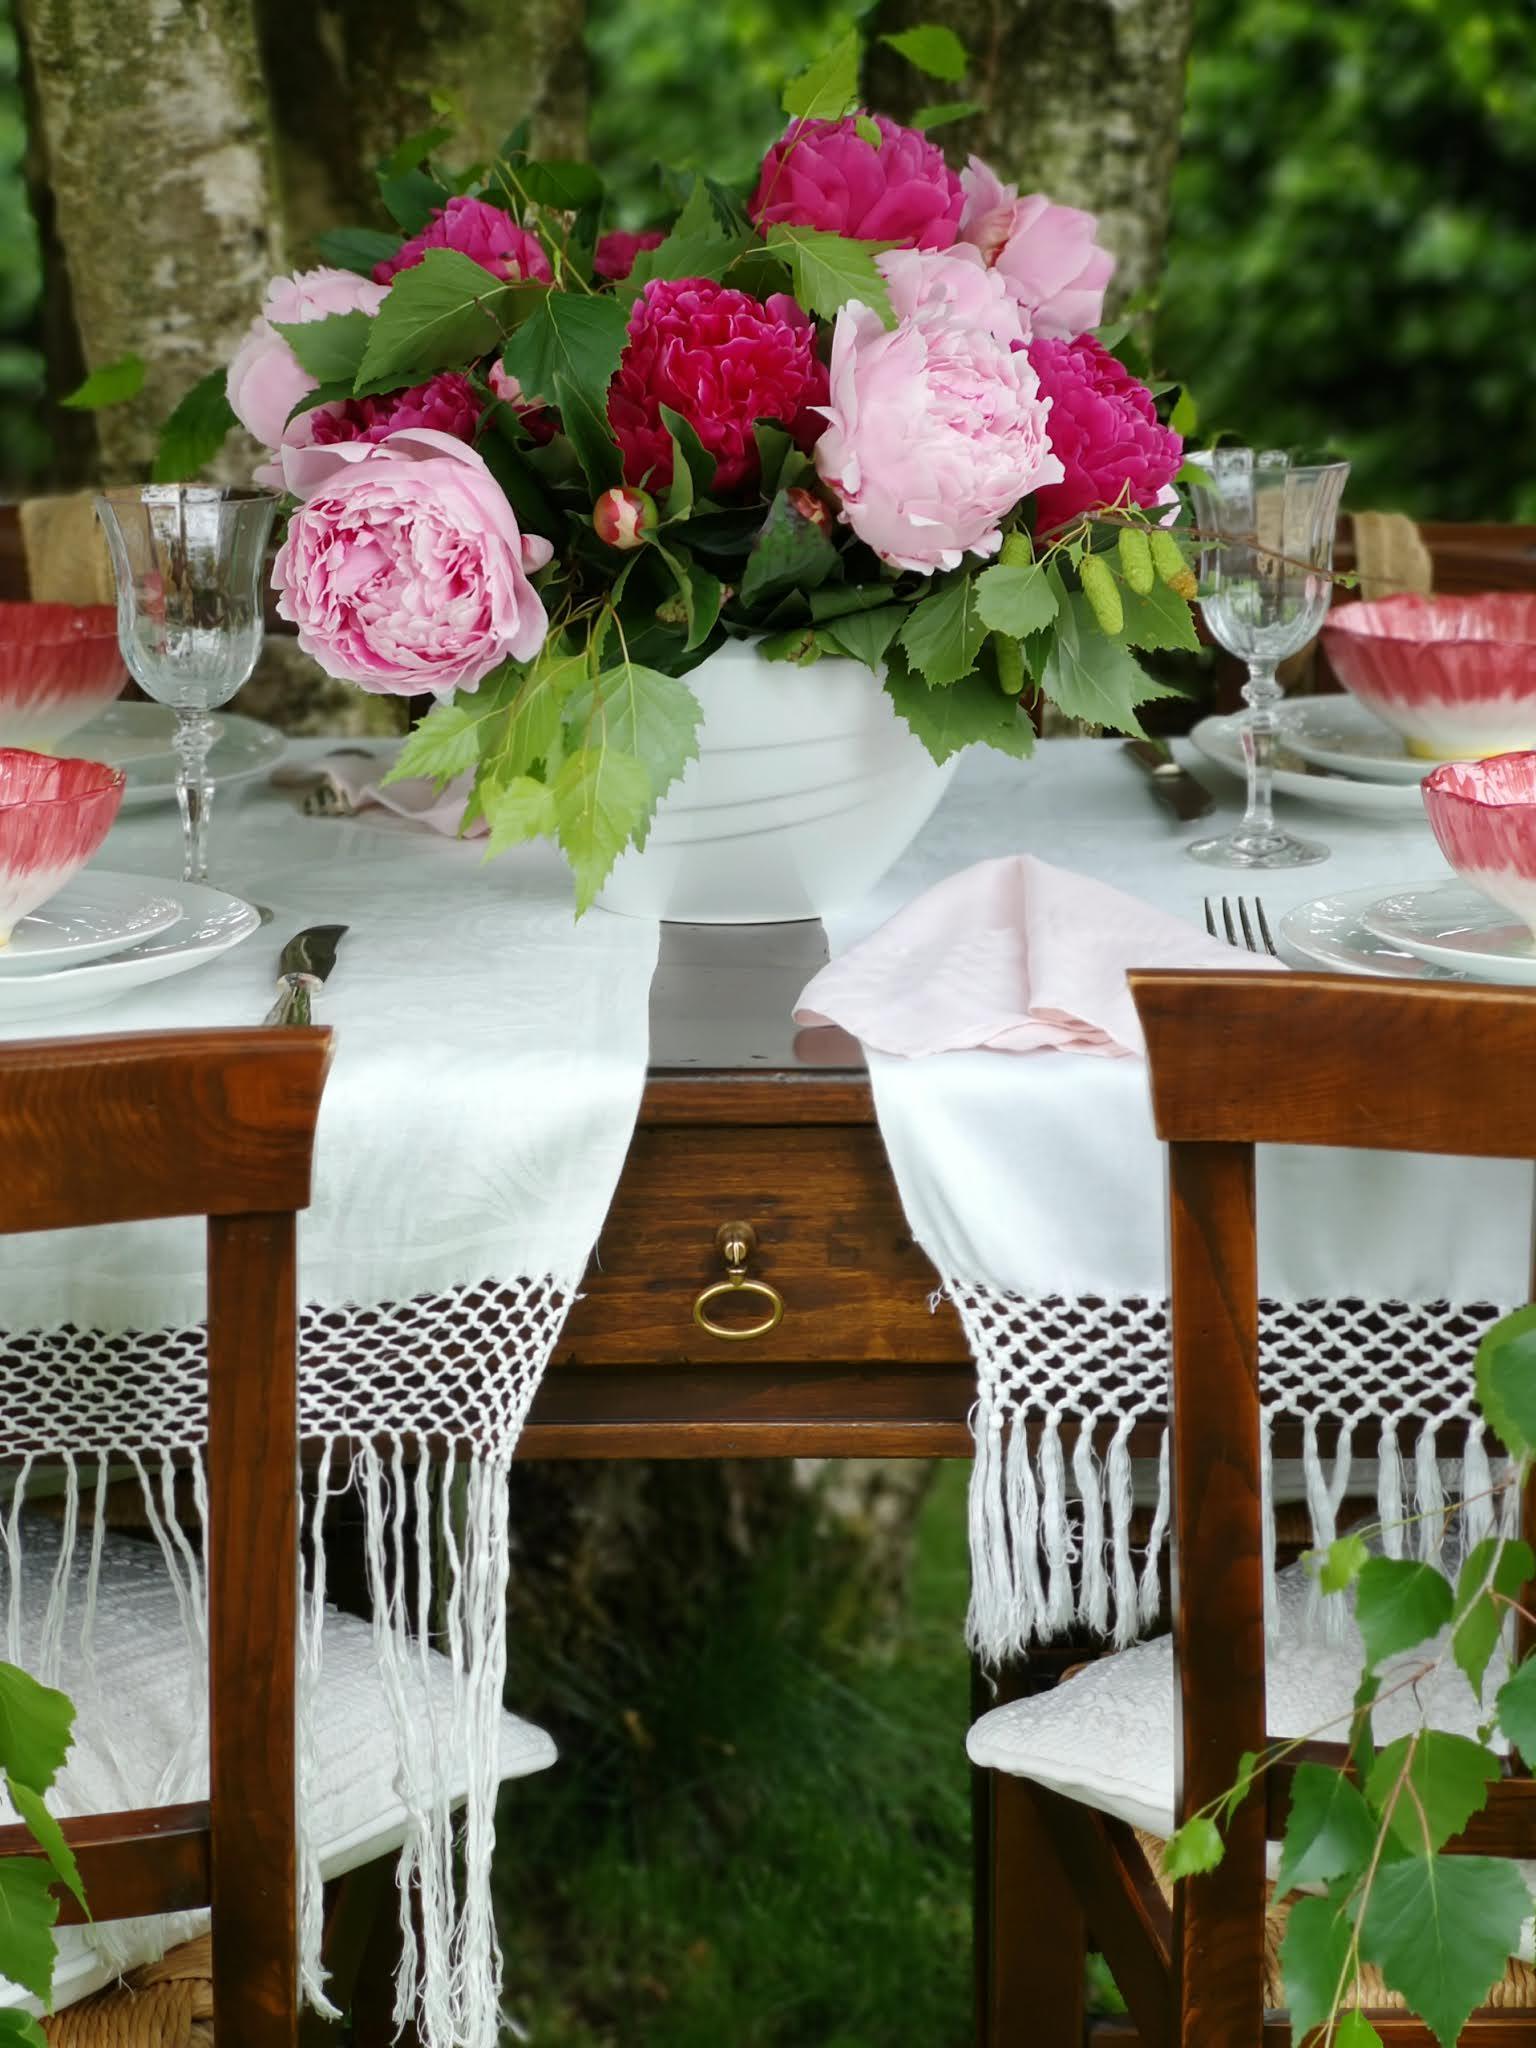 tavola estiva all'aperto